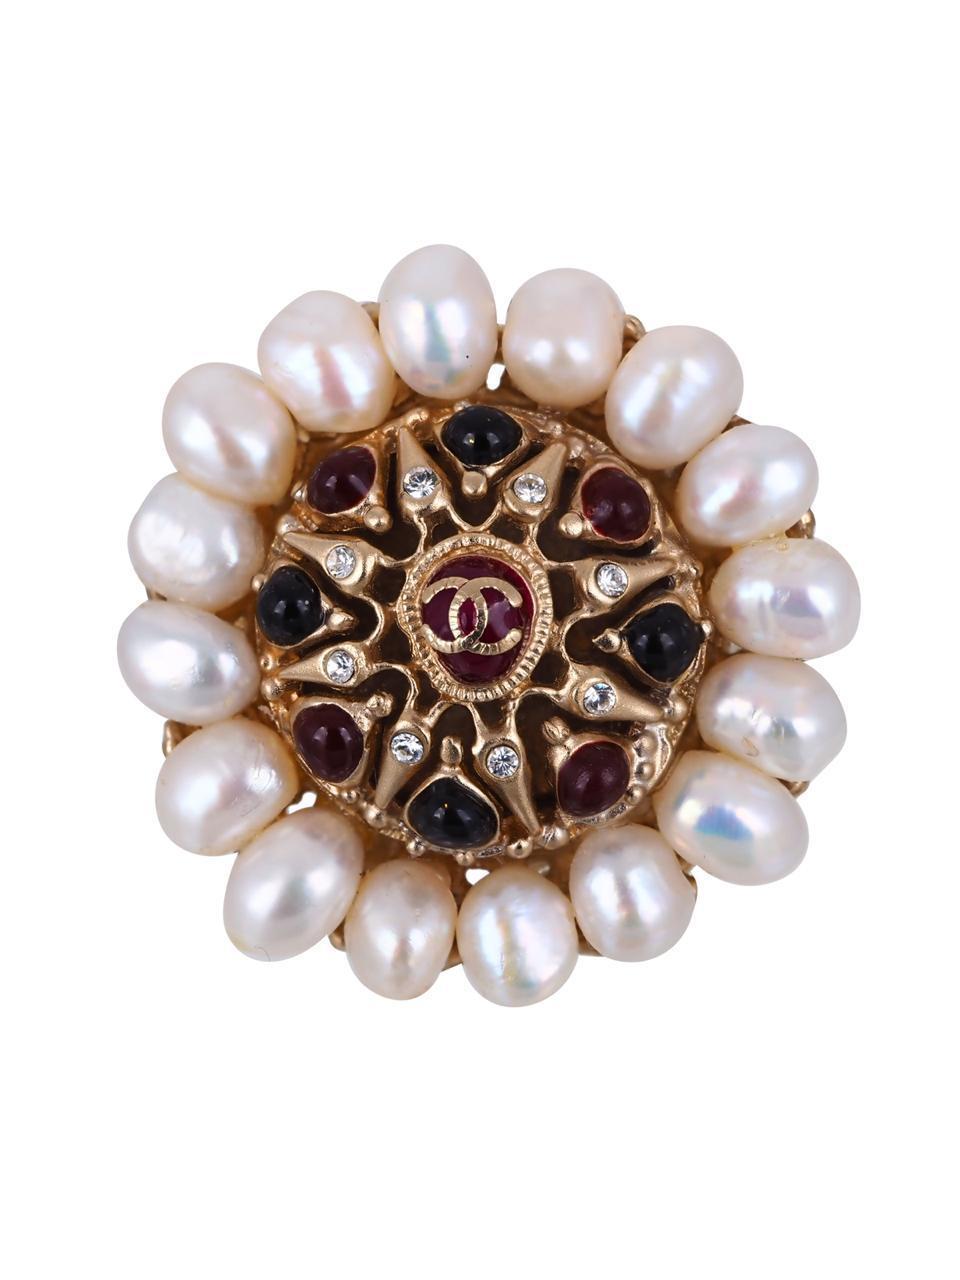 Крупное кольцо Chanel 2009 год